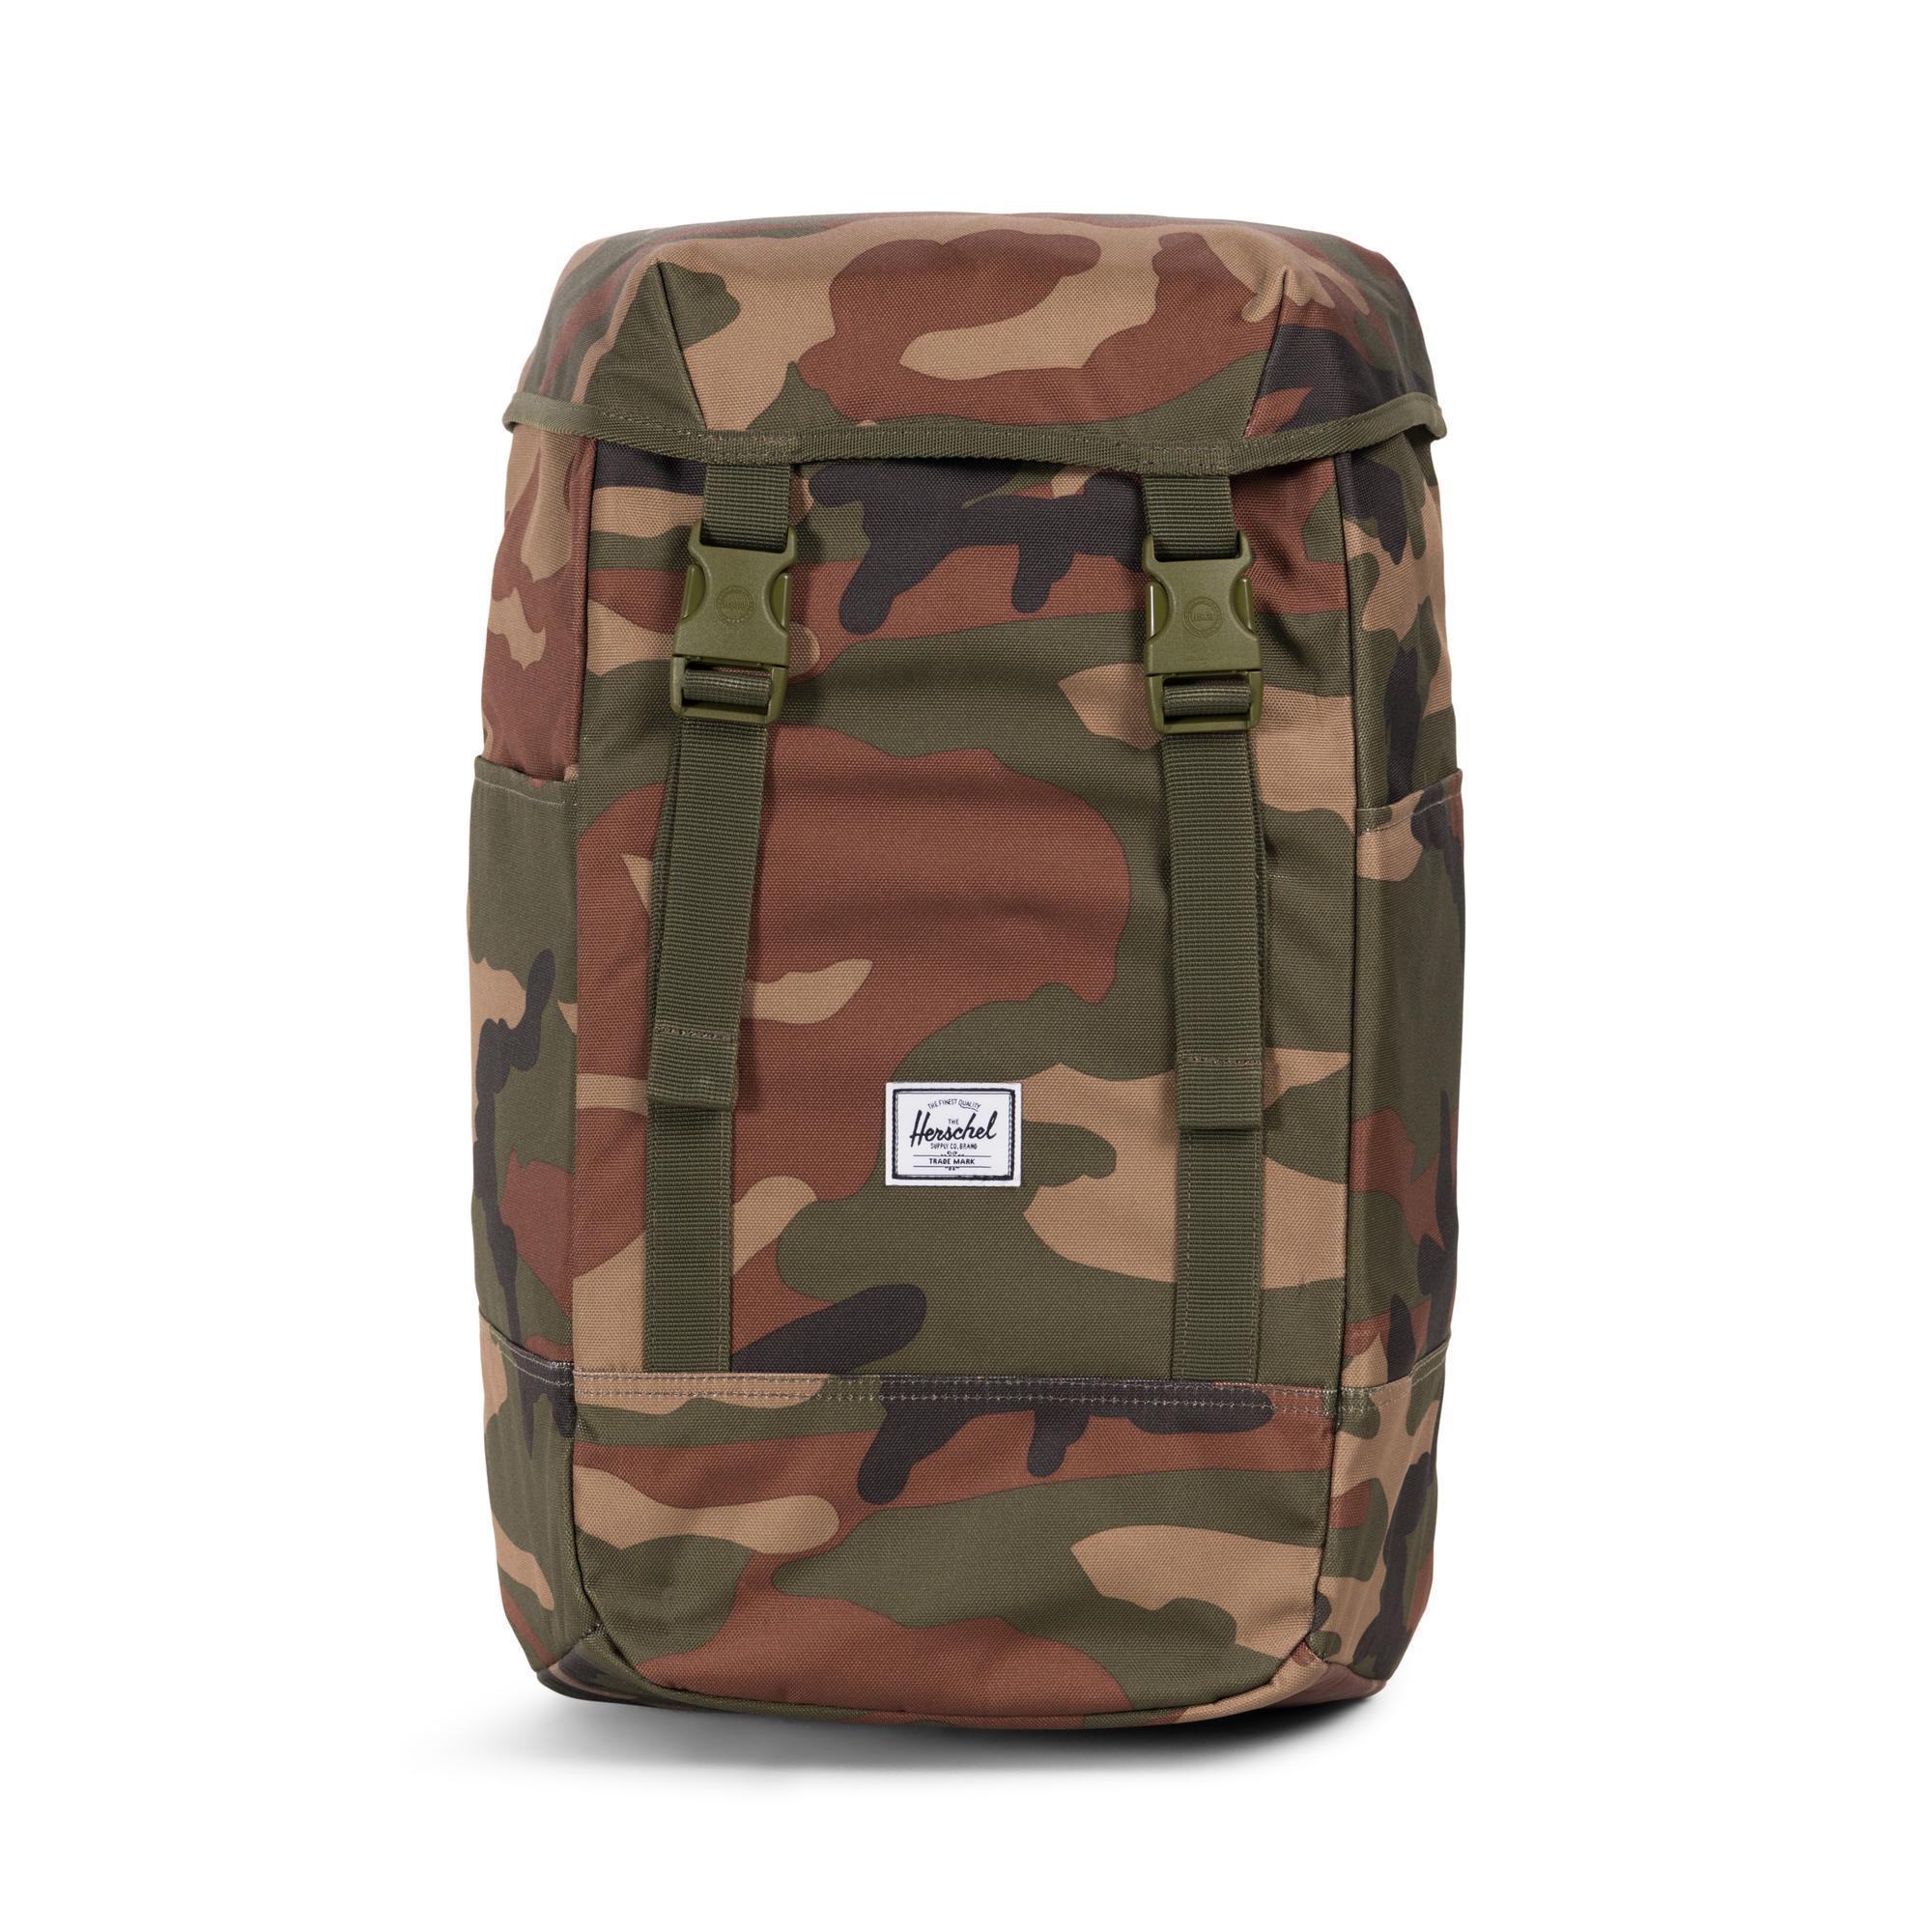 98c783175bf Iona Backpack